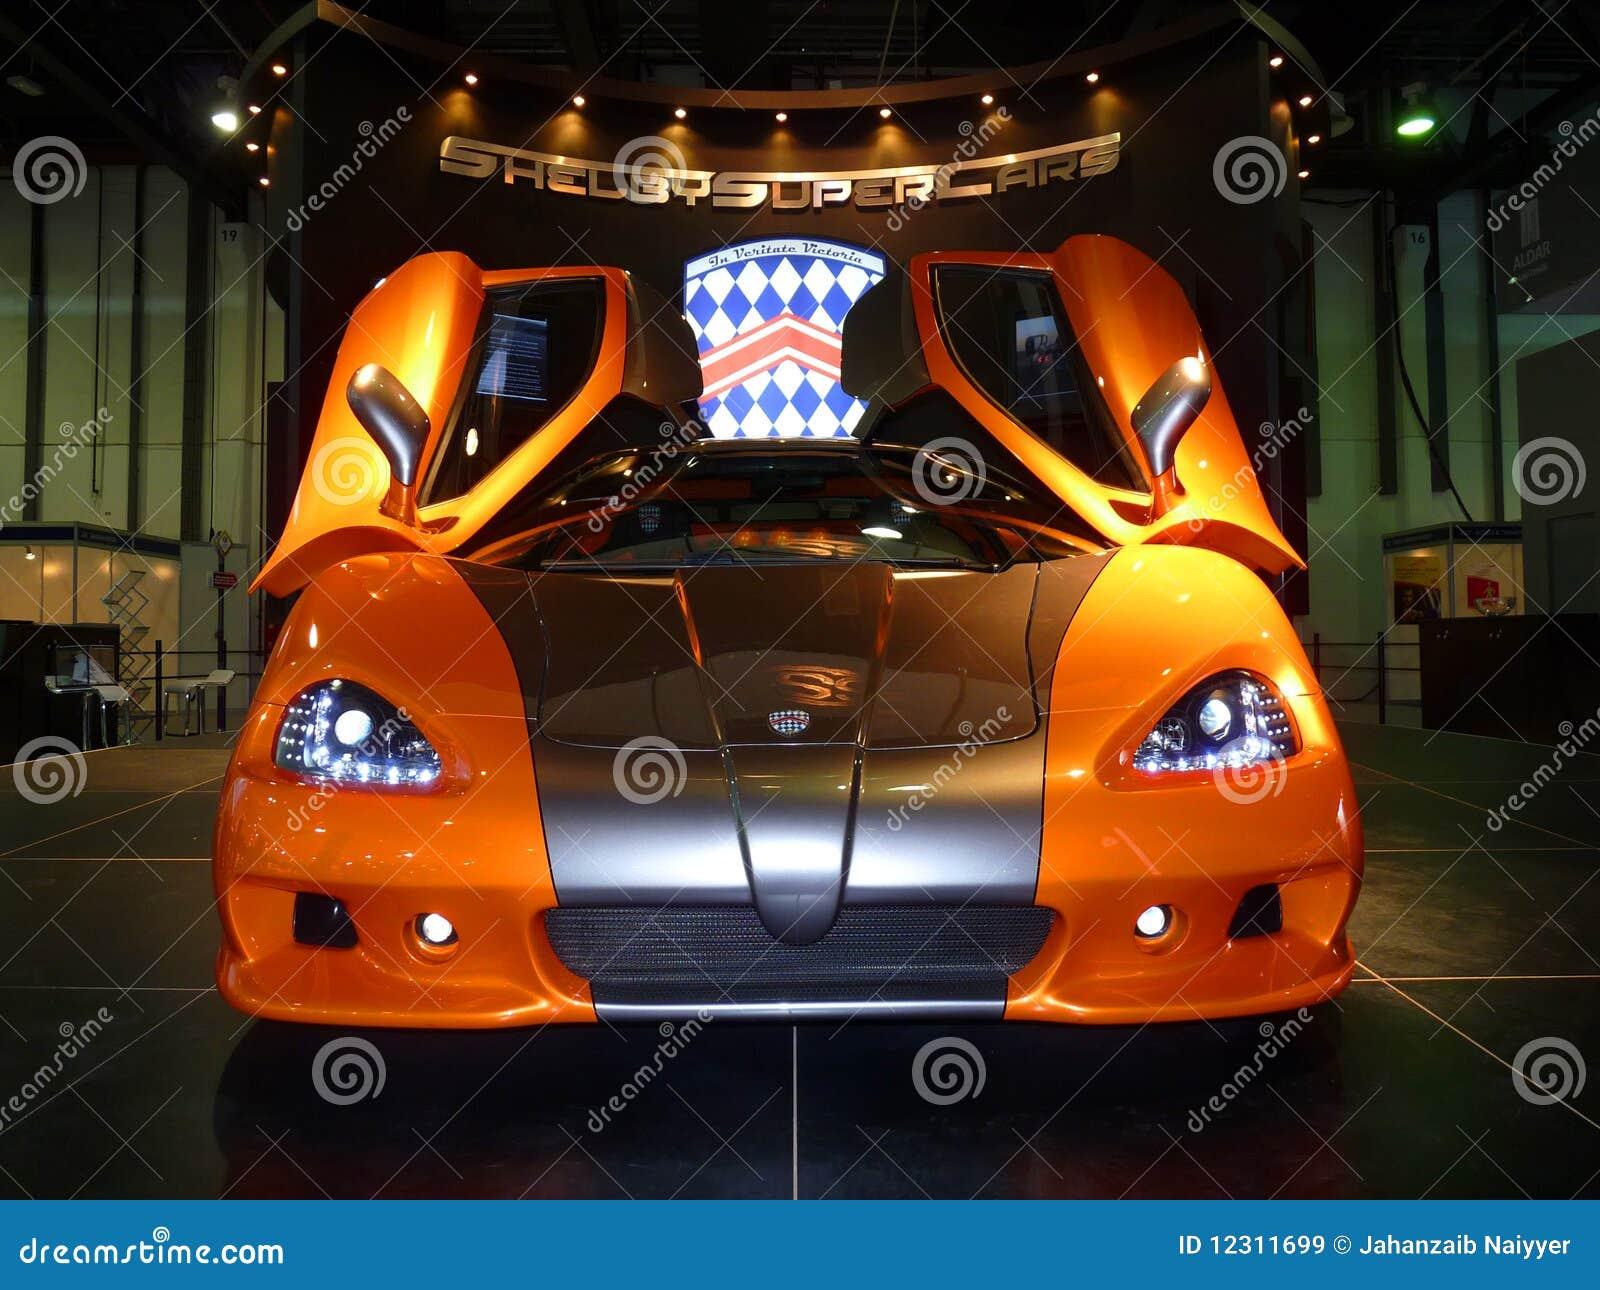 shelby schnellstes produktions auto der aero welt. Black Bedroom Furniture Sets. Home Design Ideas